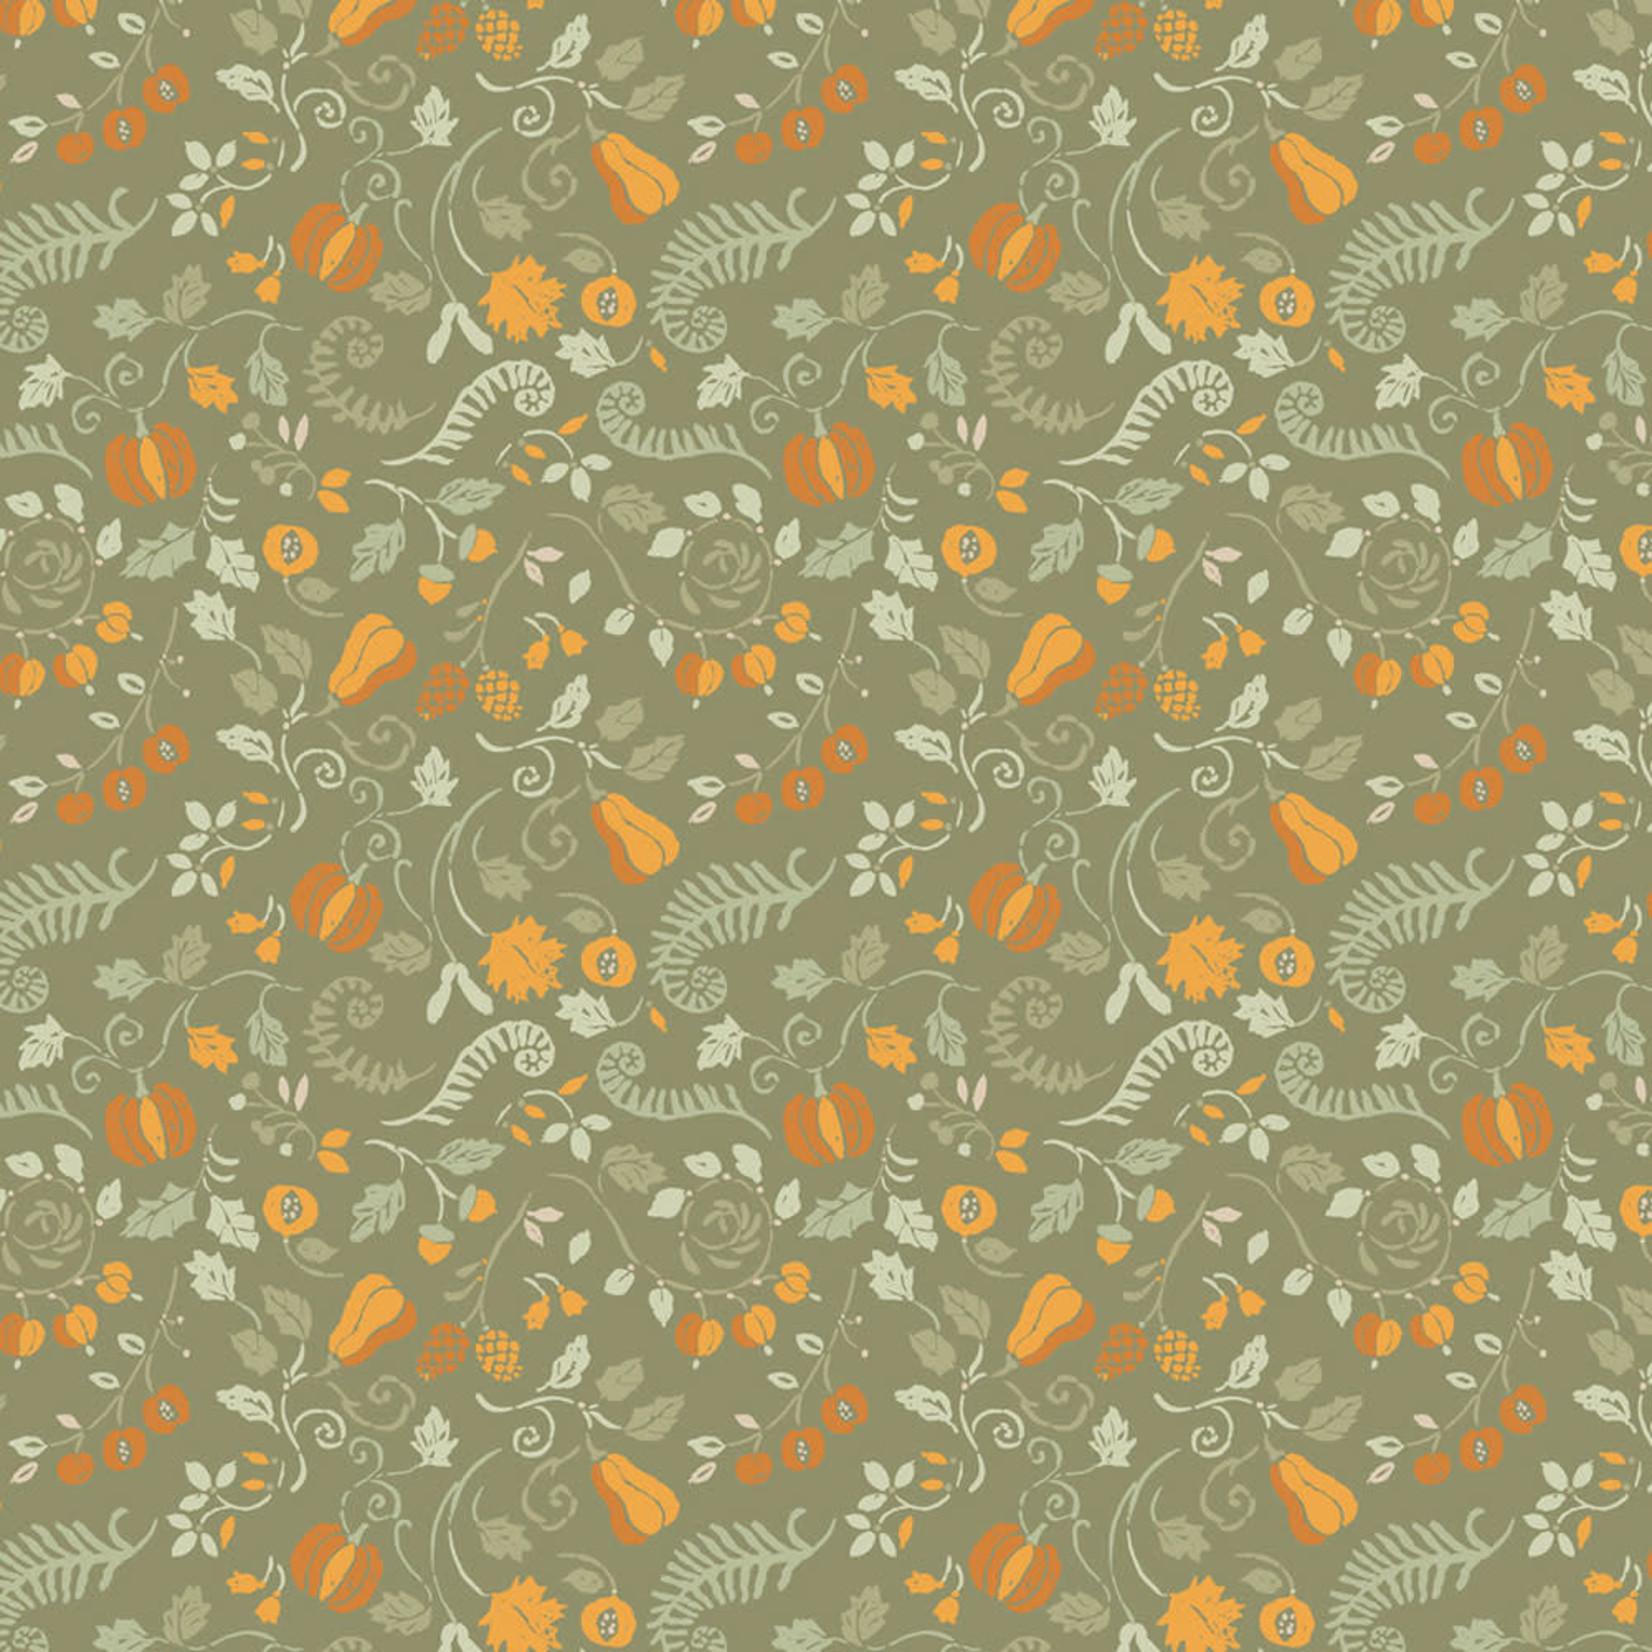 Camelot Fabrics Autumn Impressions - Oogst - Groen